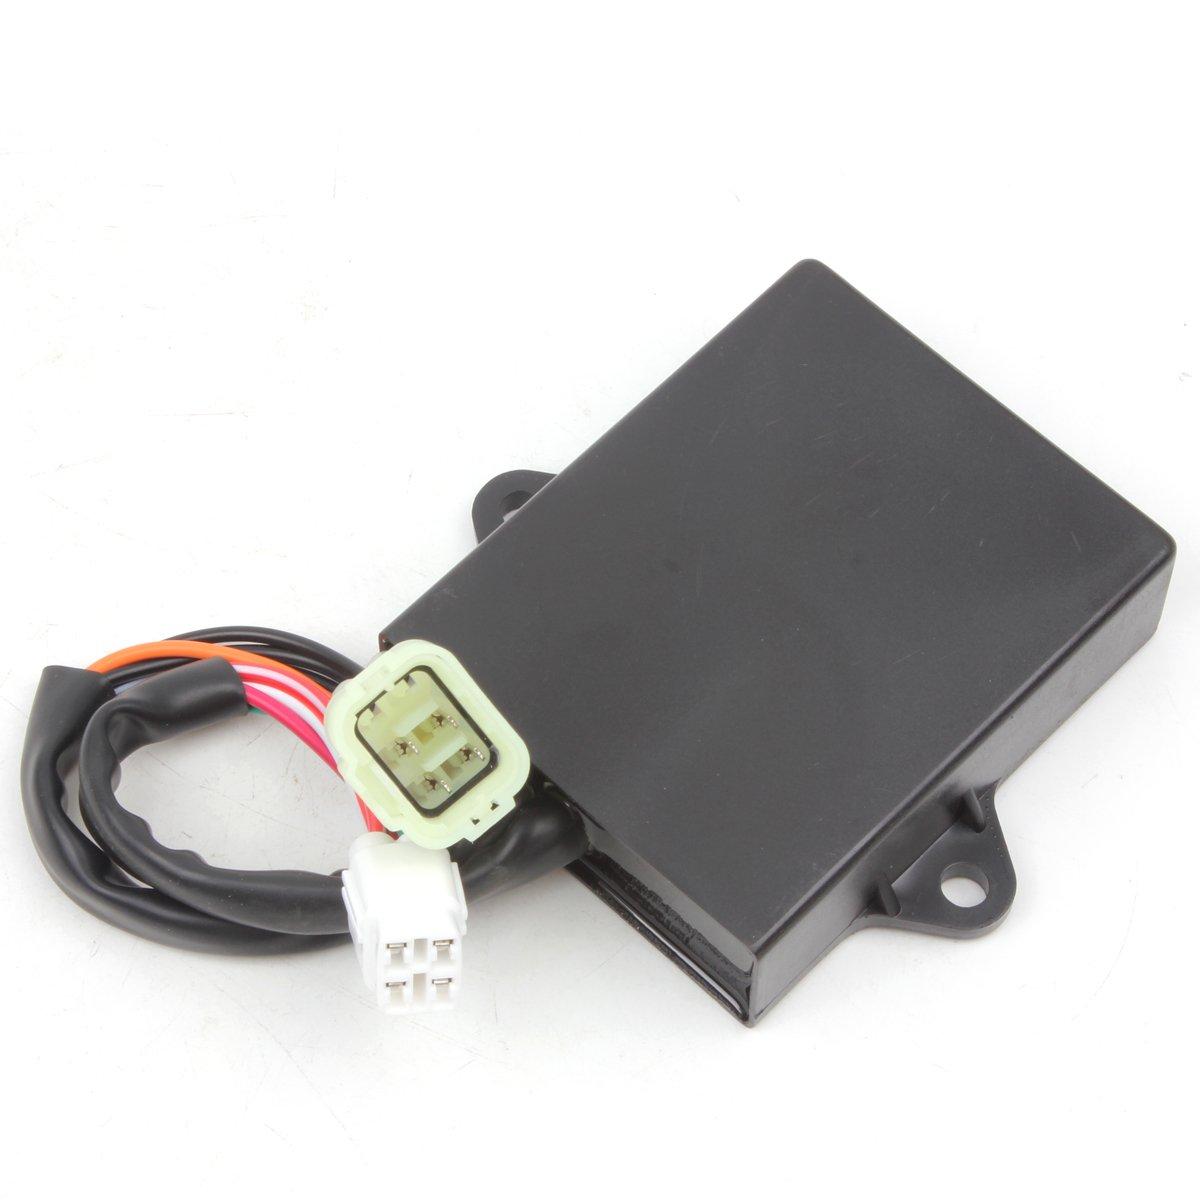 Wingsmoto Ignition CDI Box fit for YAMAHA Banshee 350 YFZ350 1997-2006 3GG-85540-10-00